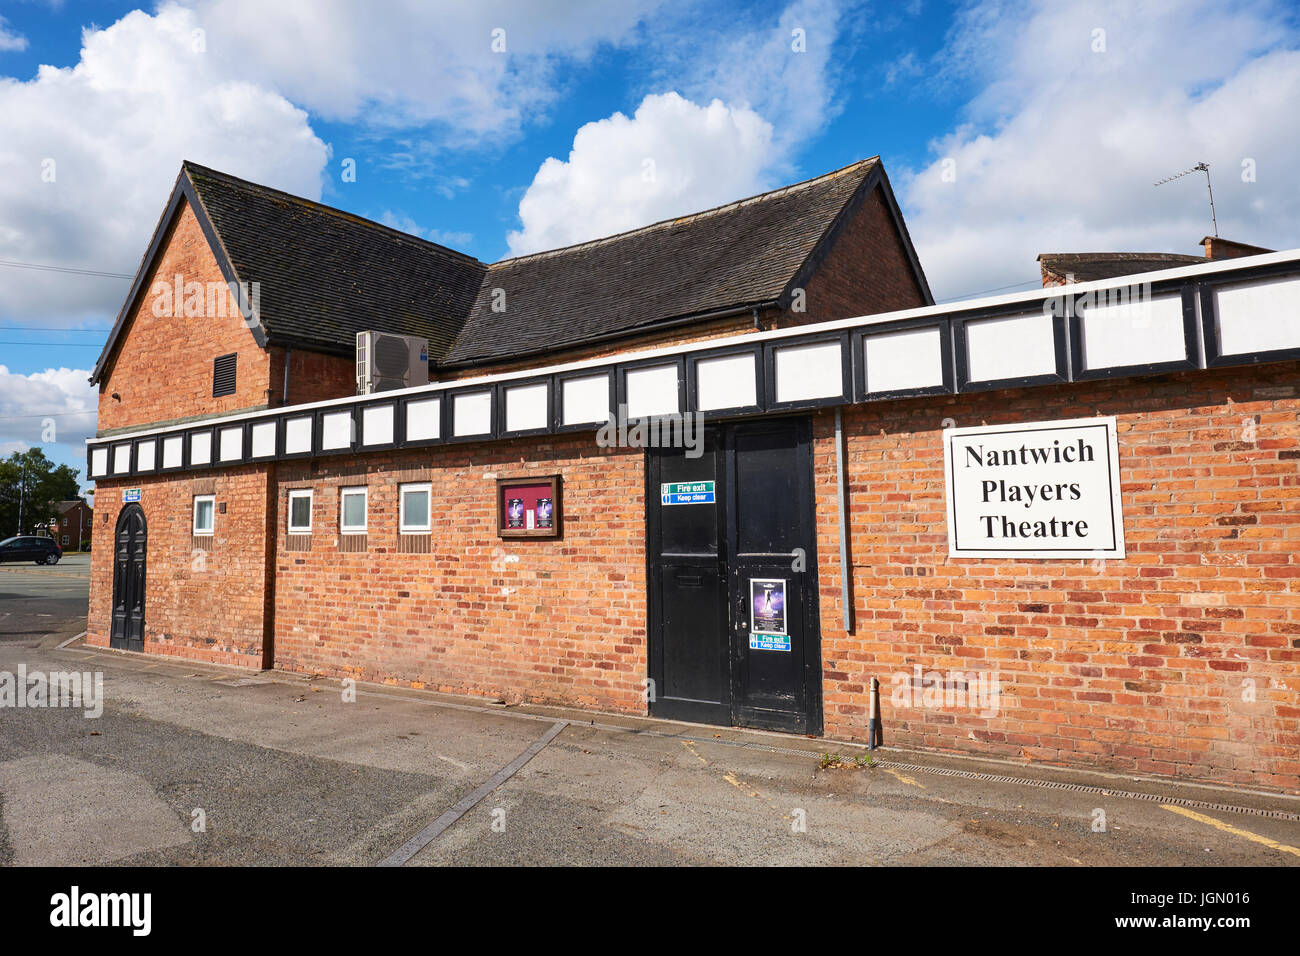 Players Theatre, Love Lane, Nantwich, Cheshire, UK - Stock Image